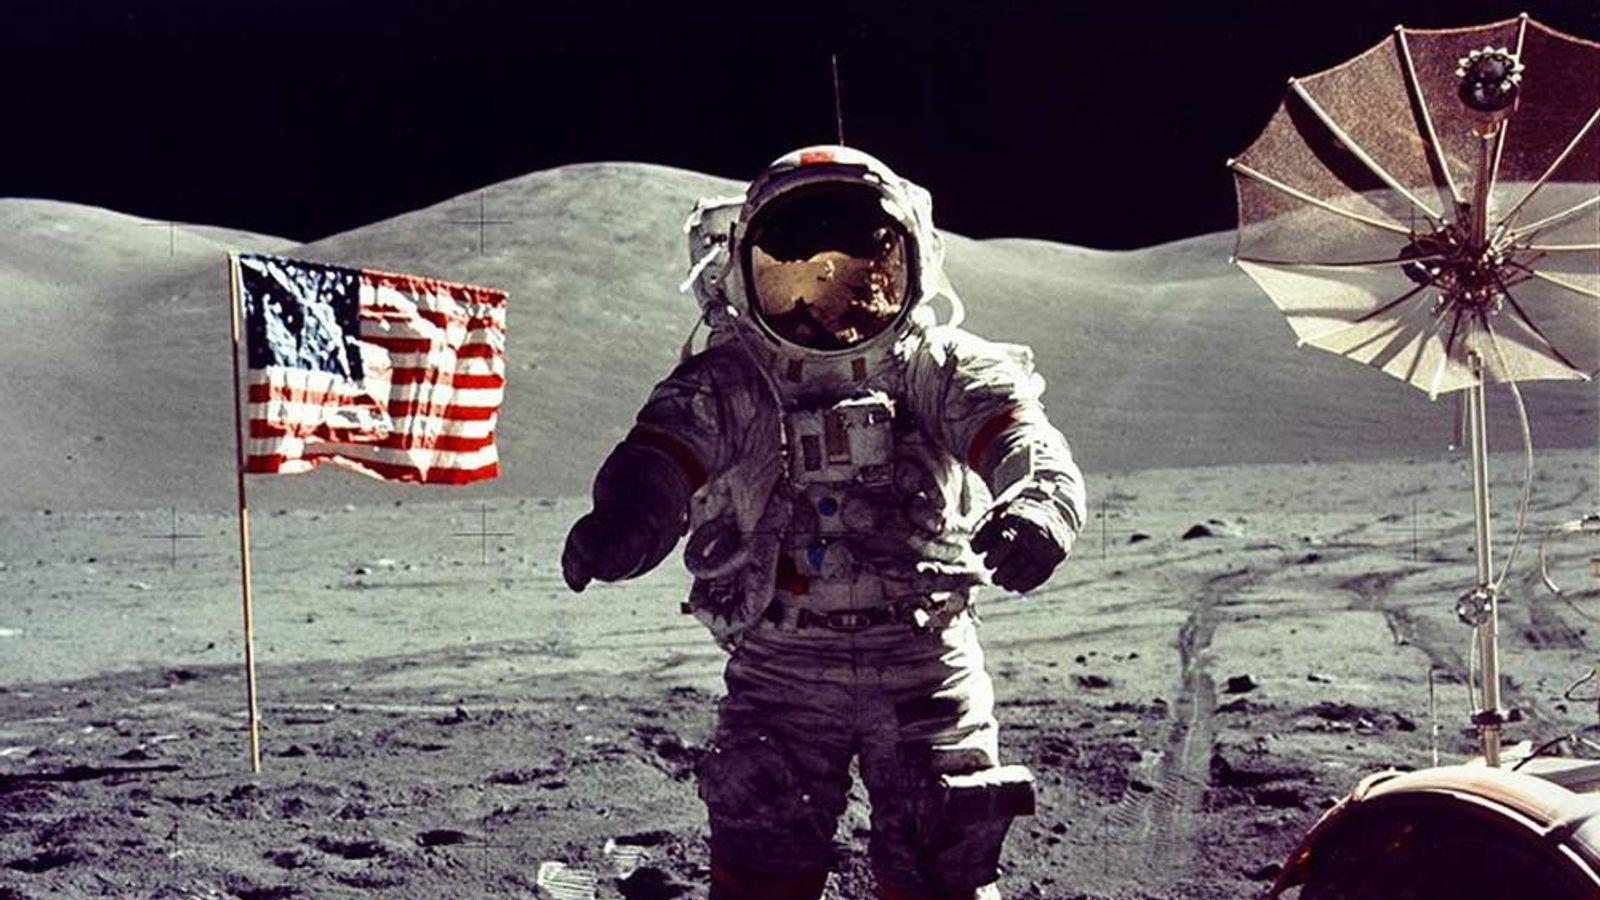 Astronaut Eugene Cernan walks on the moon